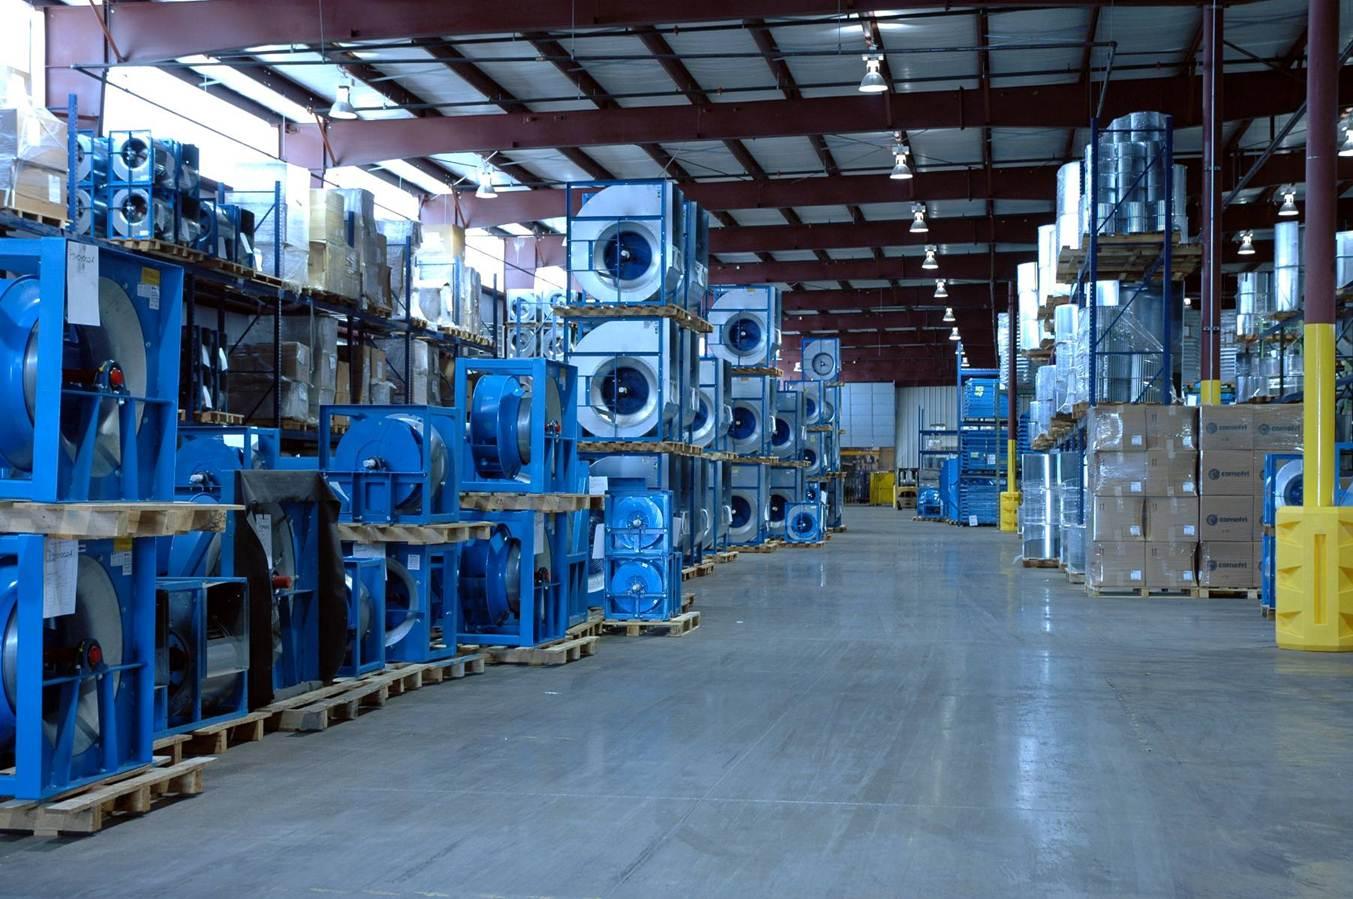 Comefri USA - Finished Products Warehouse